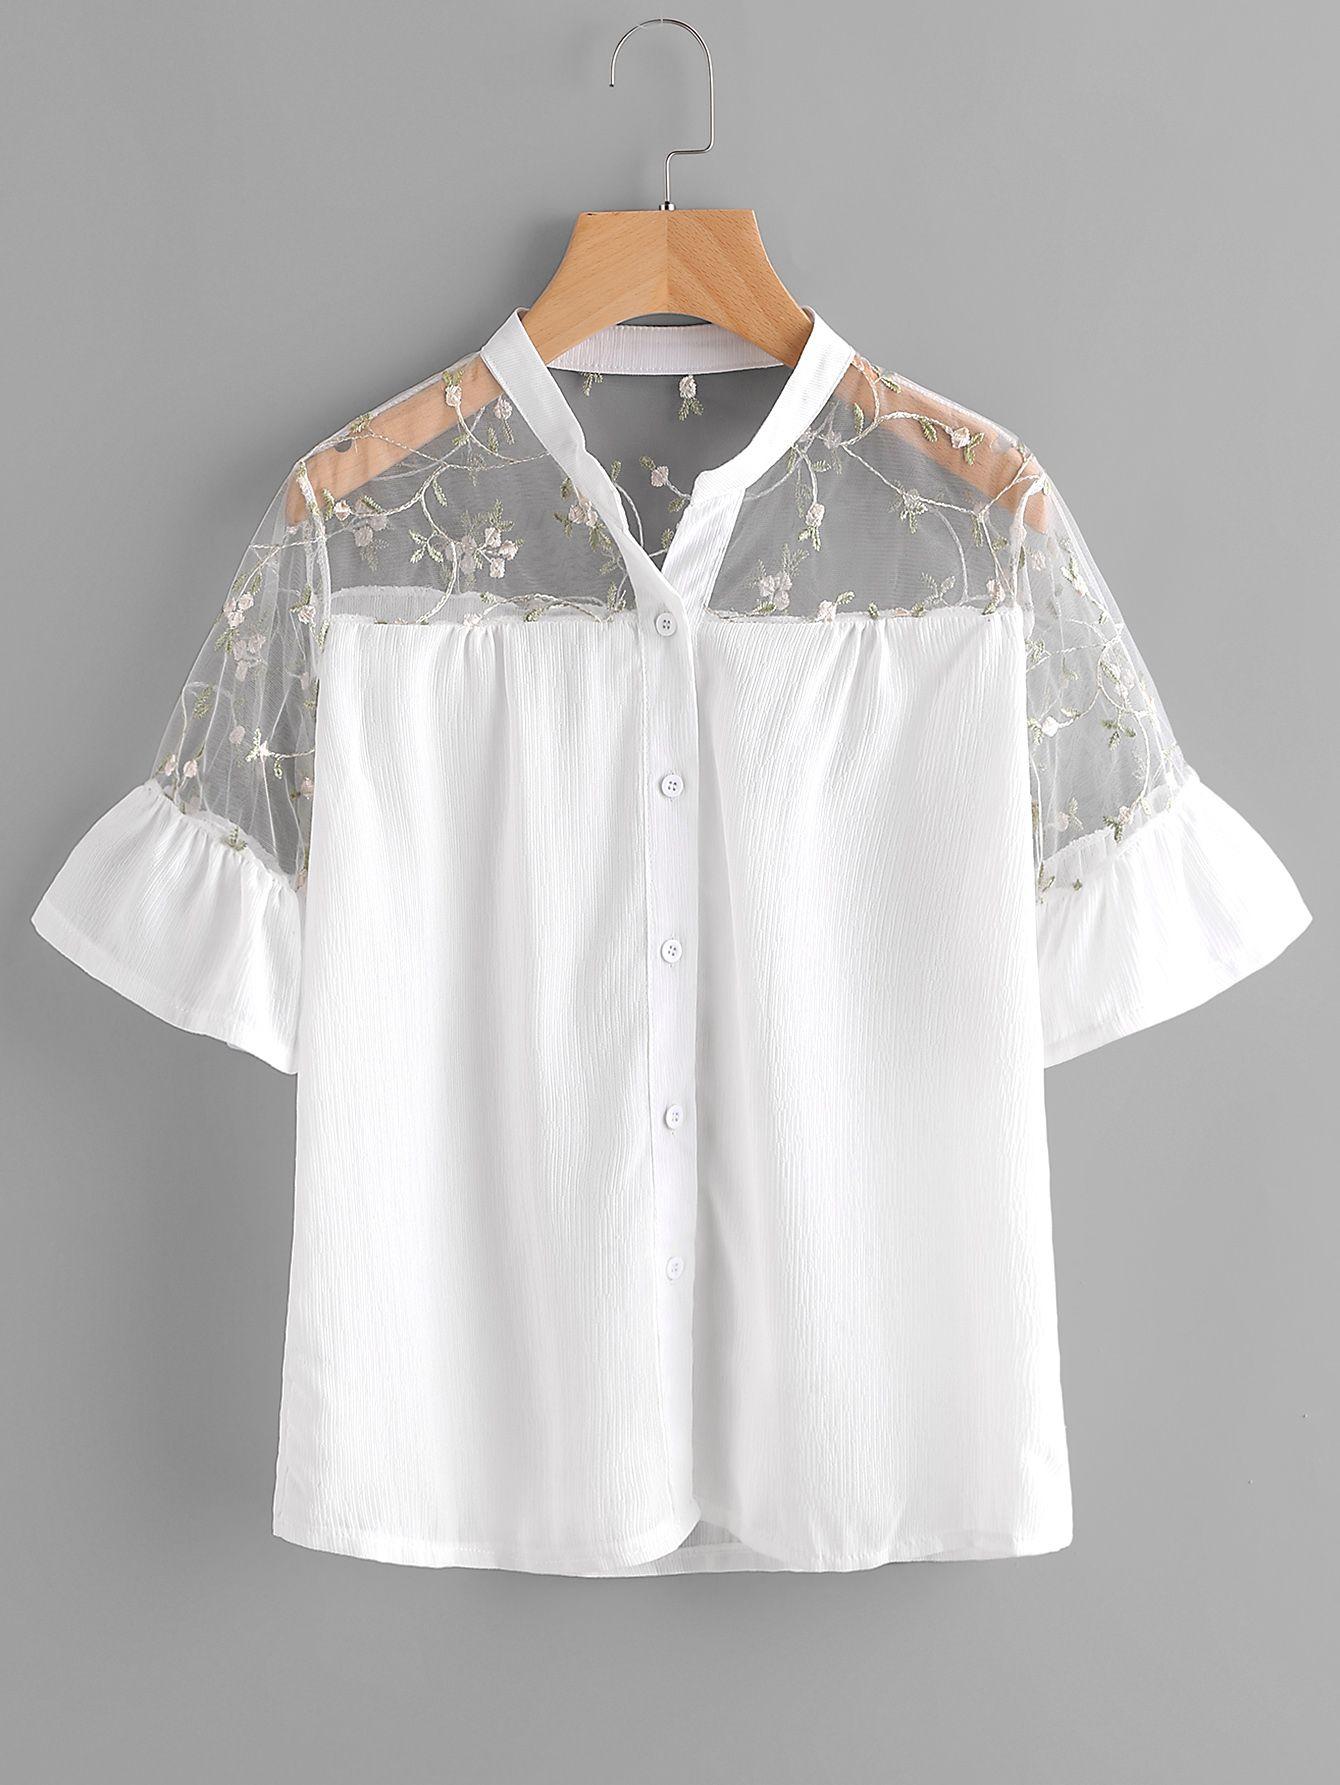 Shop embroidery mesh yoke frill cuff shirt online shein offers